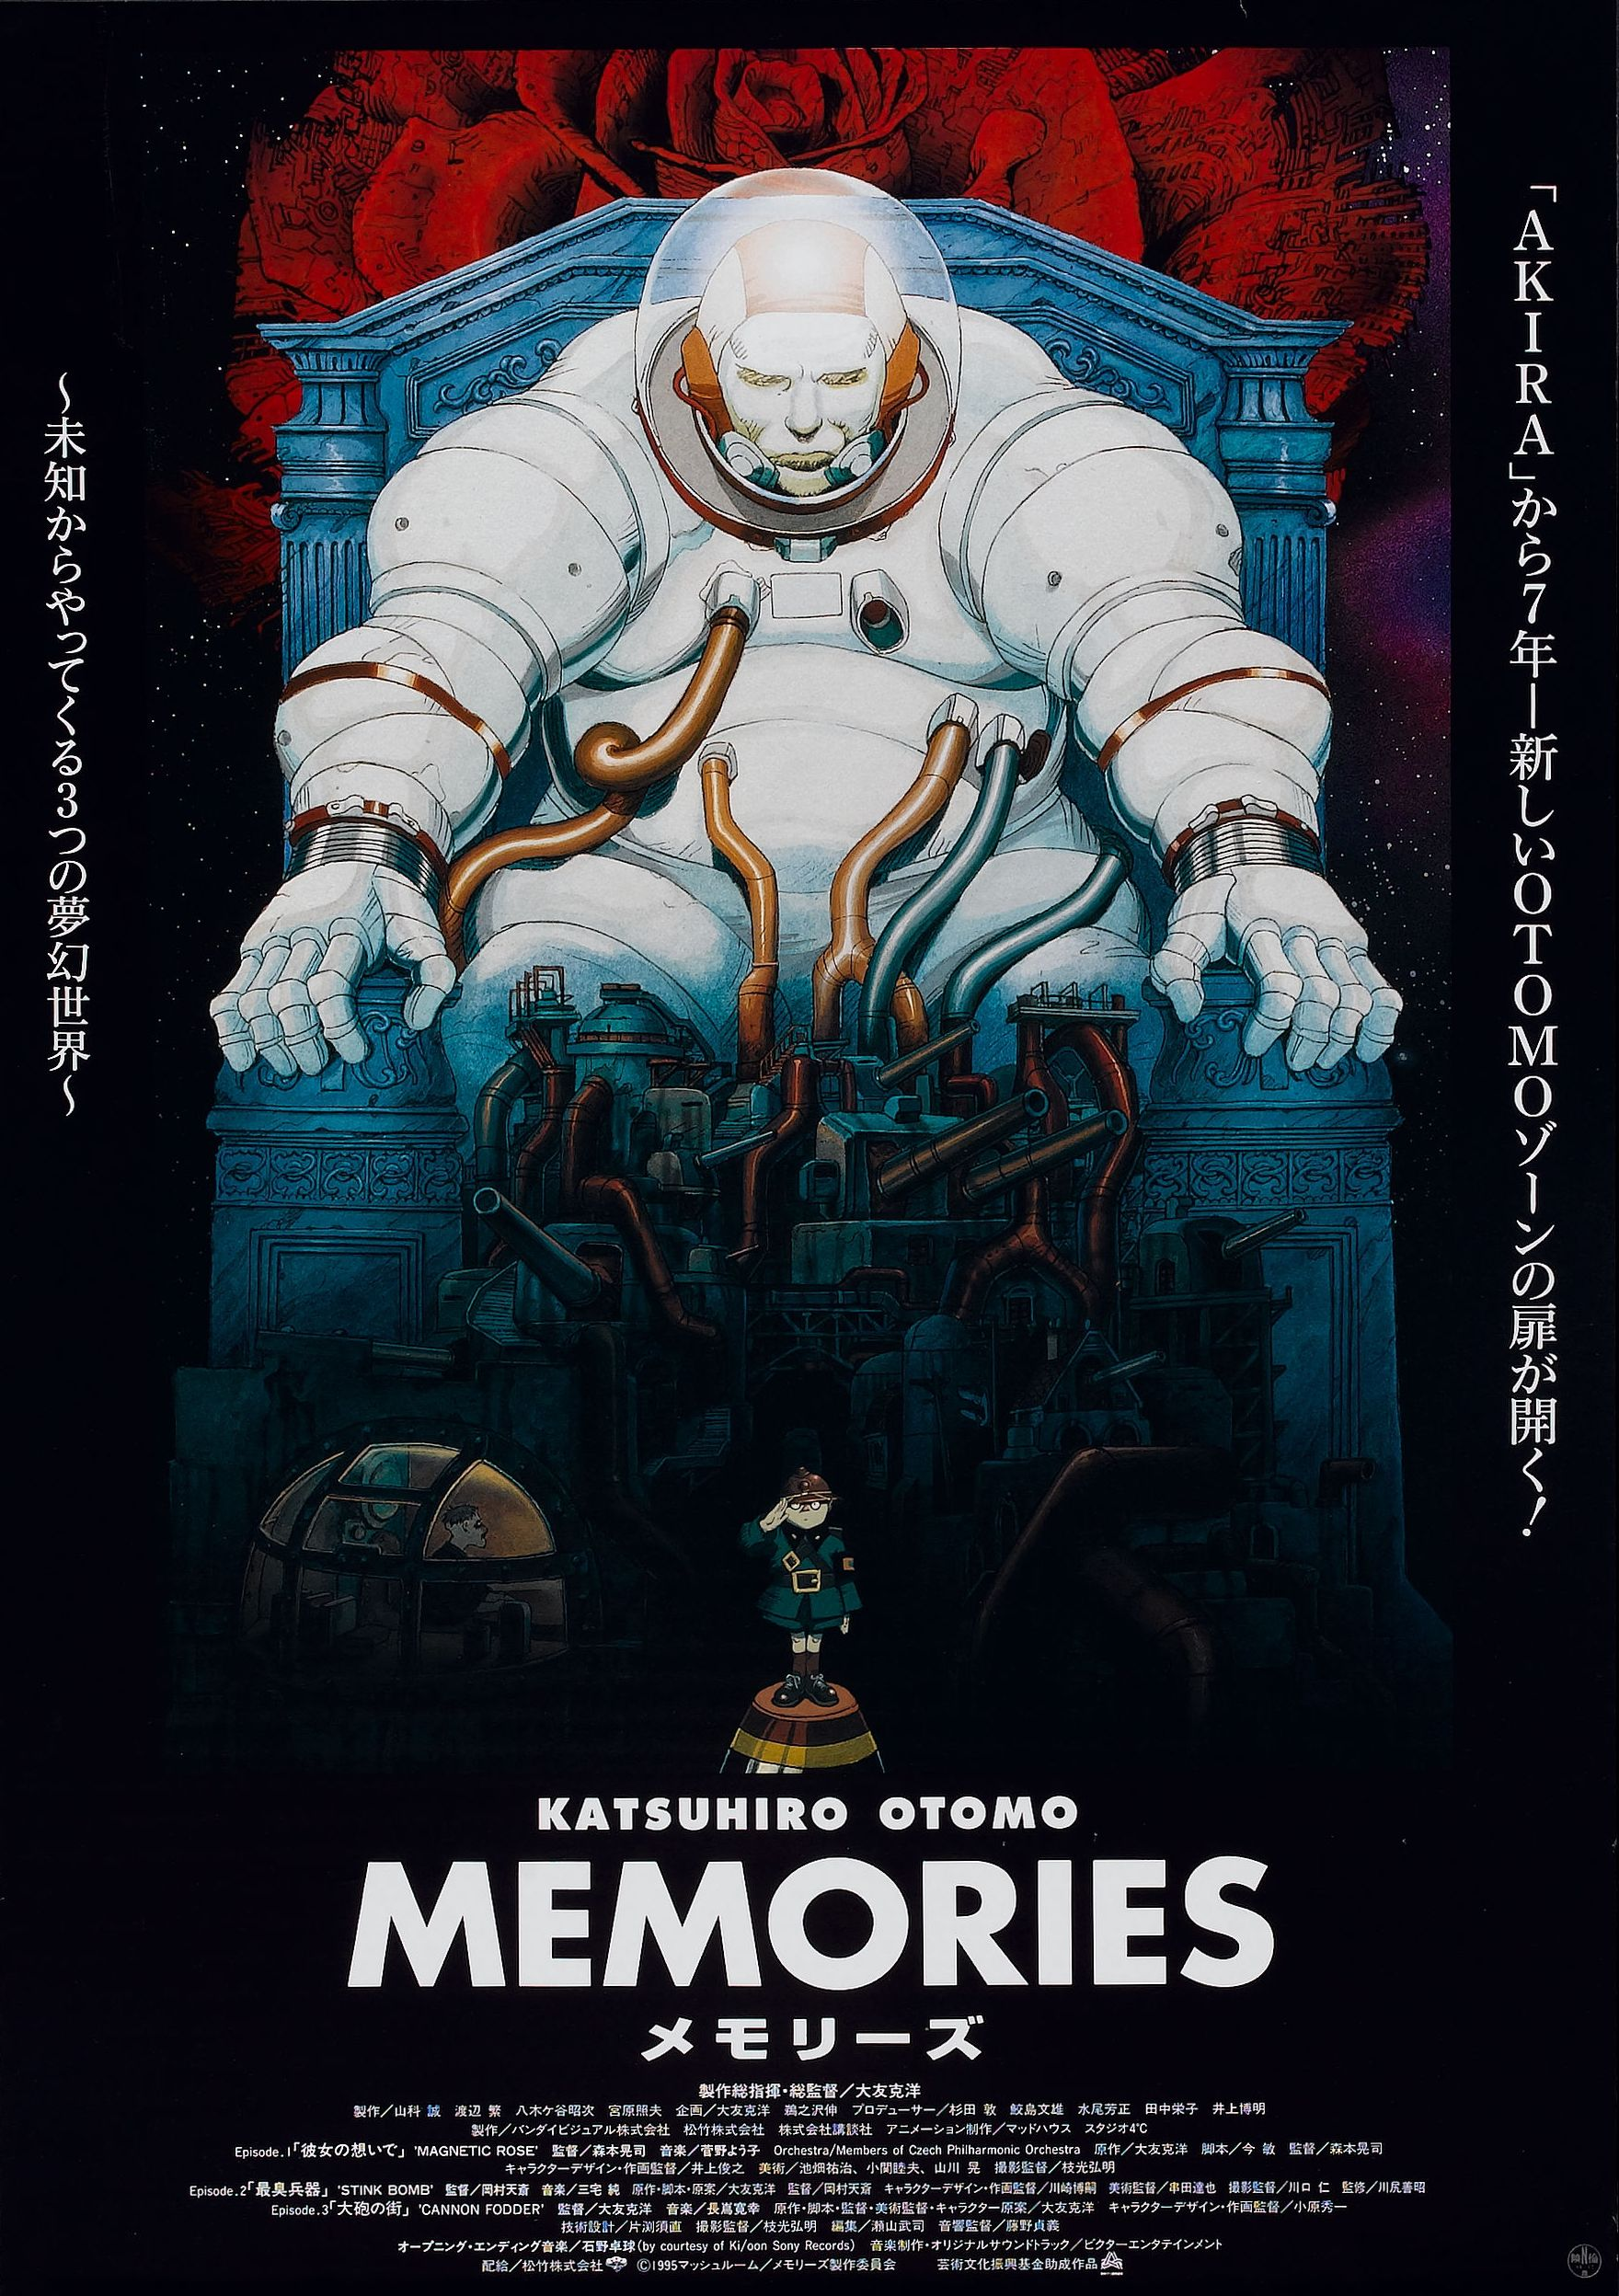 Memories Anime Posters Wallpaper 1760x2496 197580 Wallpaperup